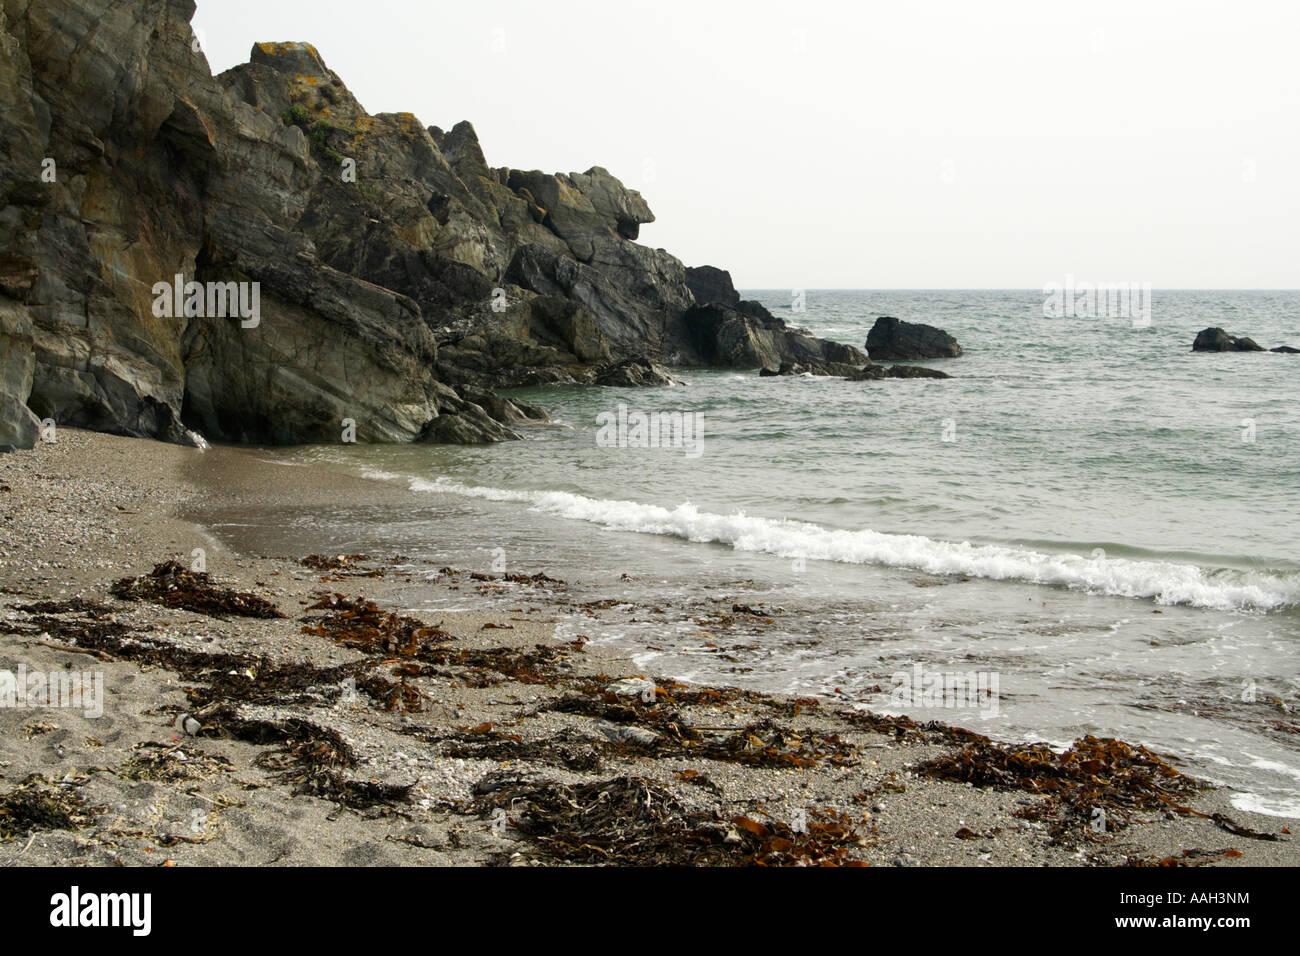 Port Wrinkle, Cornwall, UK. - Stock Image